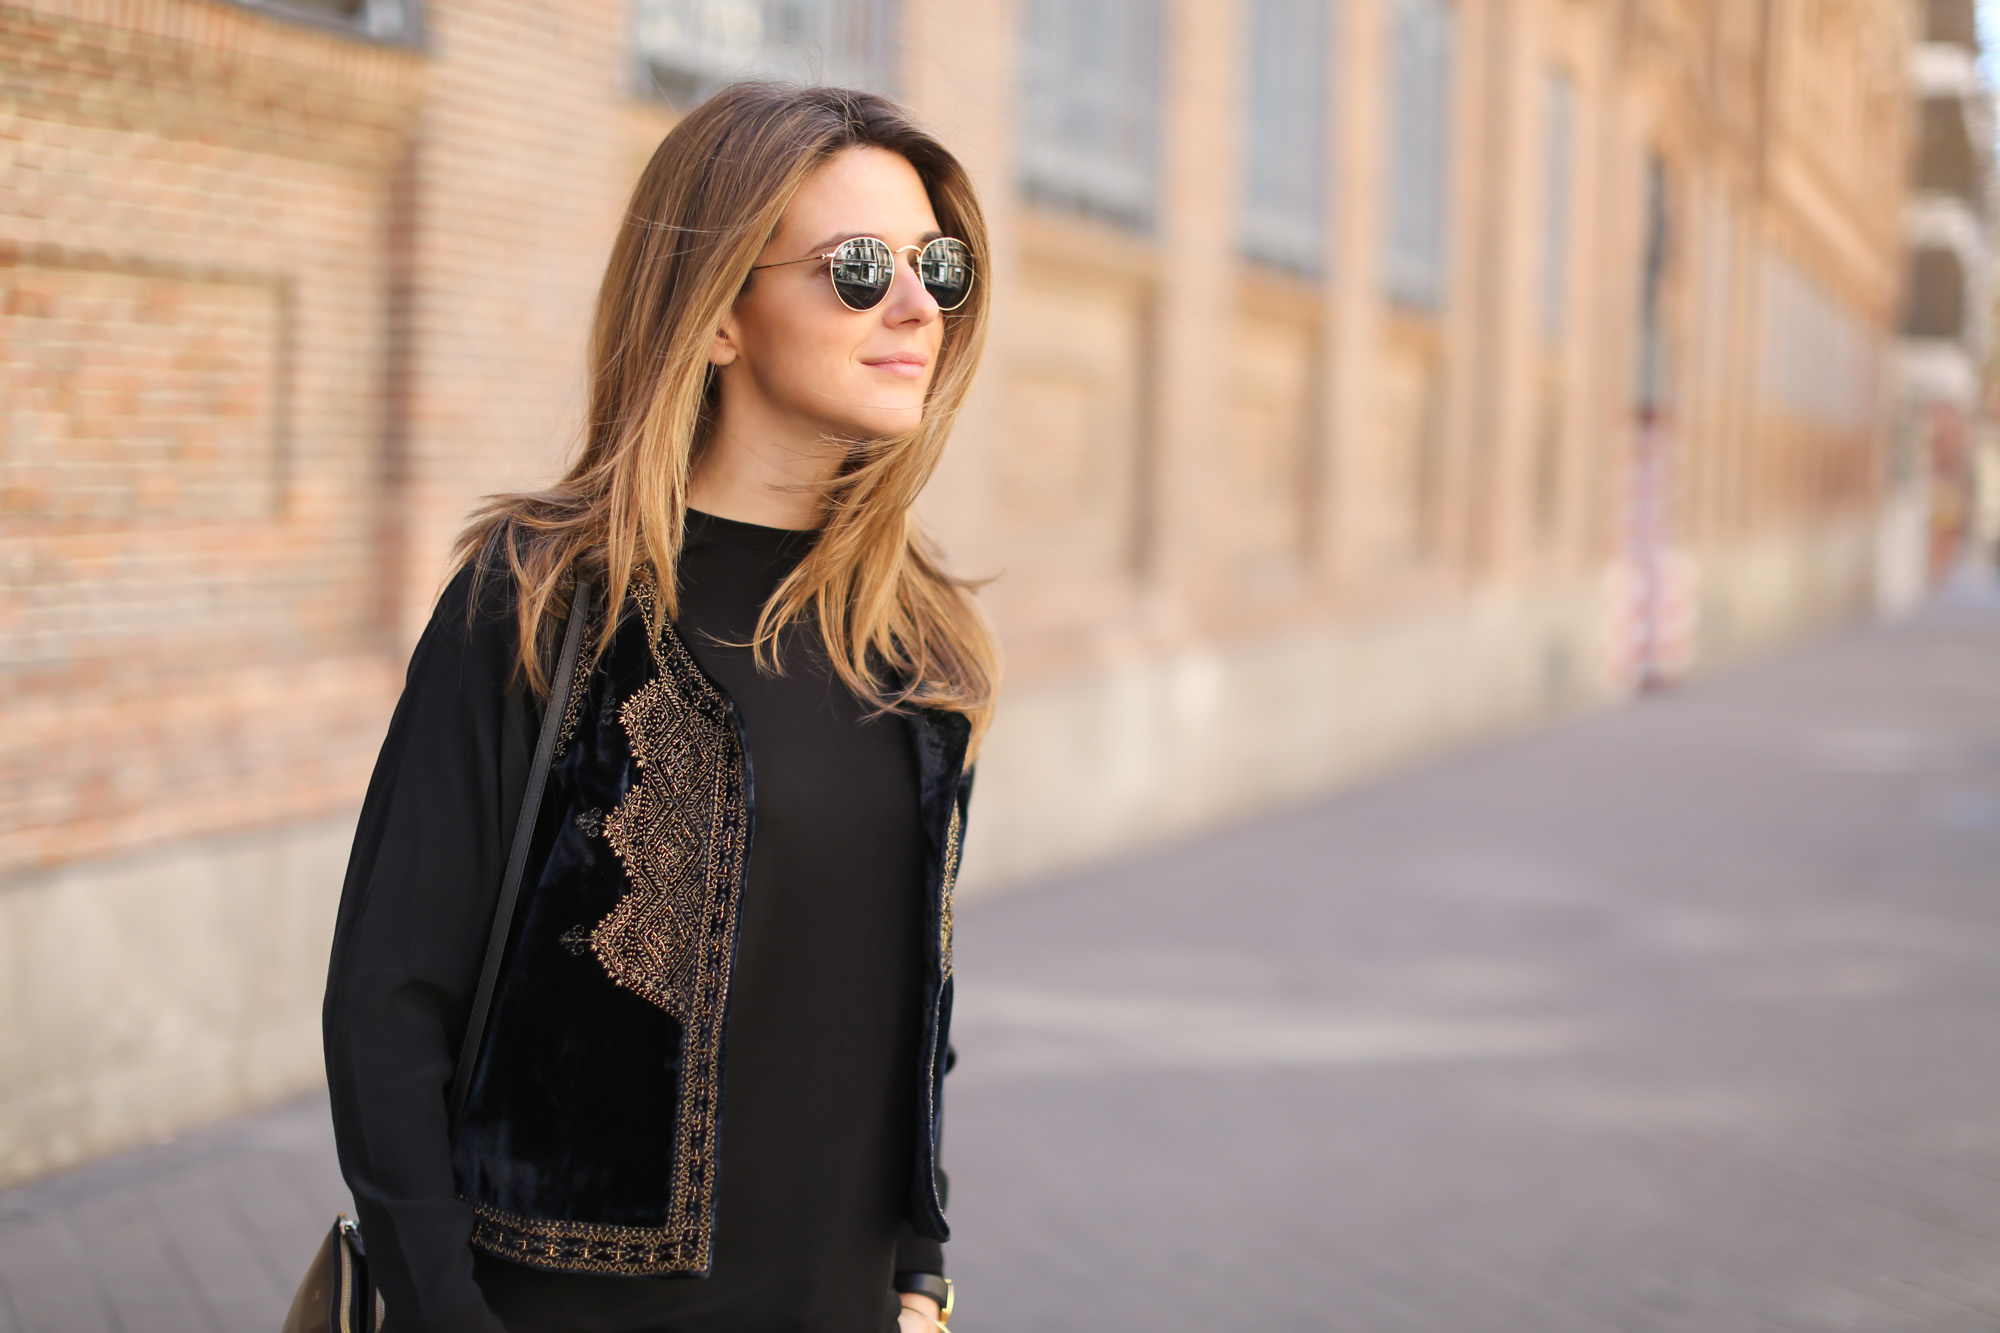 Clochet-streetstyle-zara-black-flared-jeans-boho-vest-larssonandjennins-saxon-8